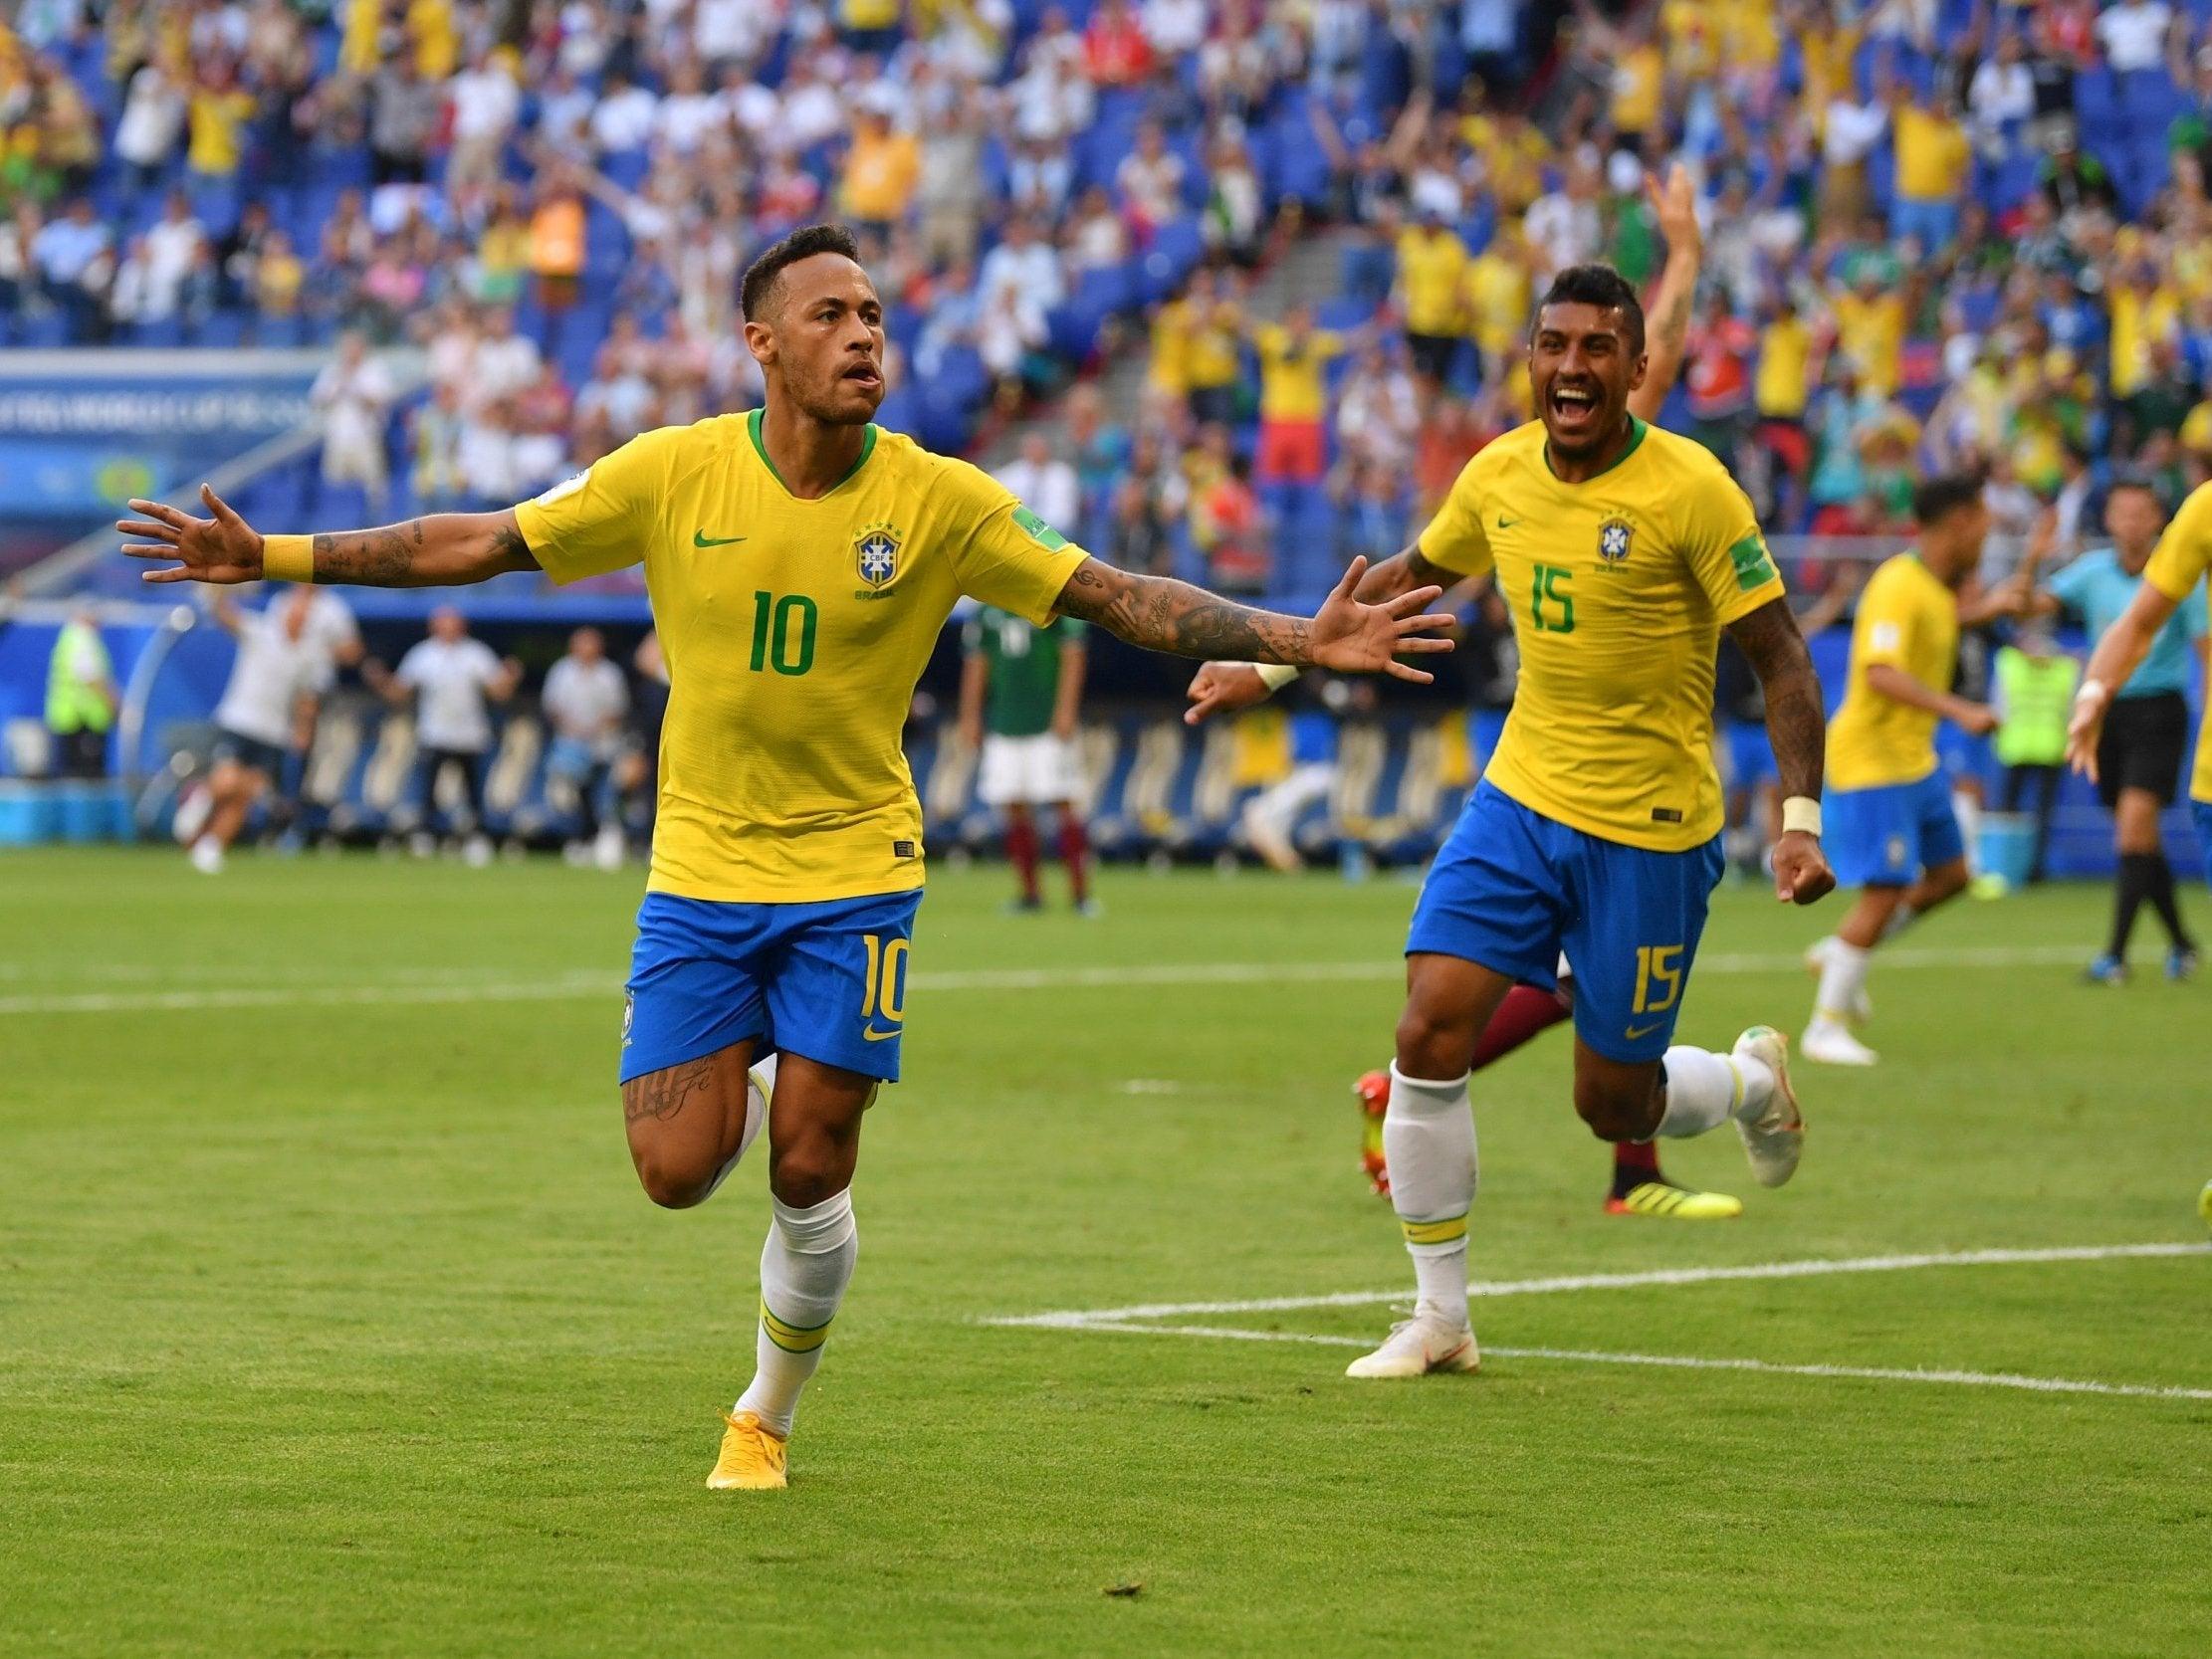 Brazil vs Mexico, World Cup 2018: Neymar steps up to lead ...